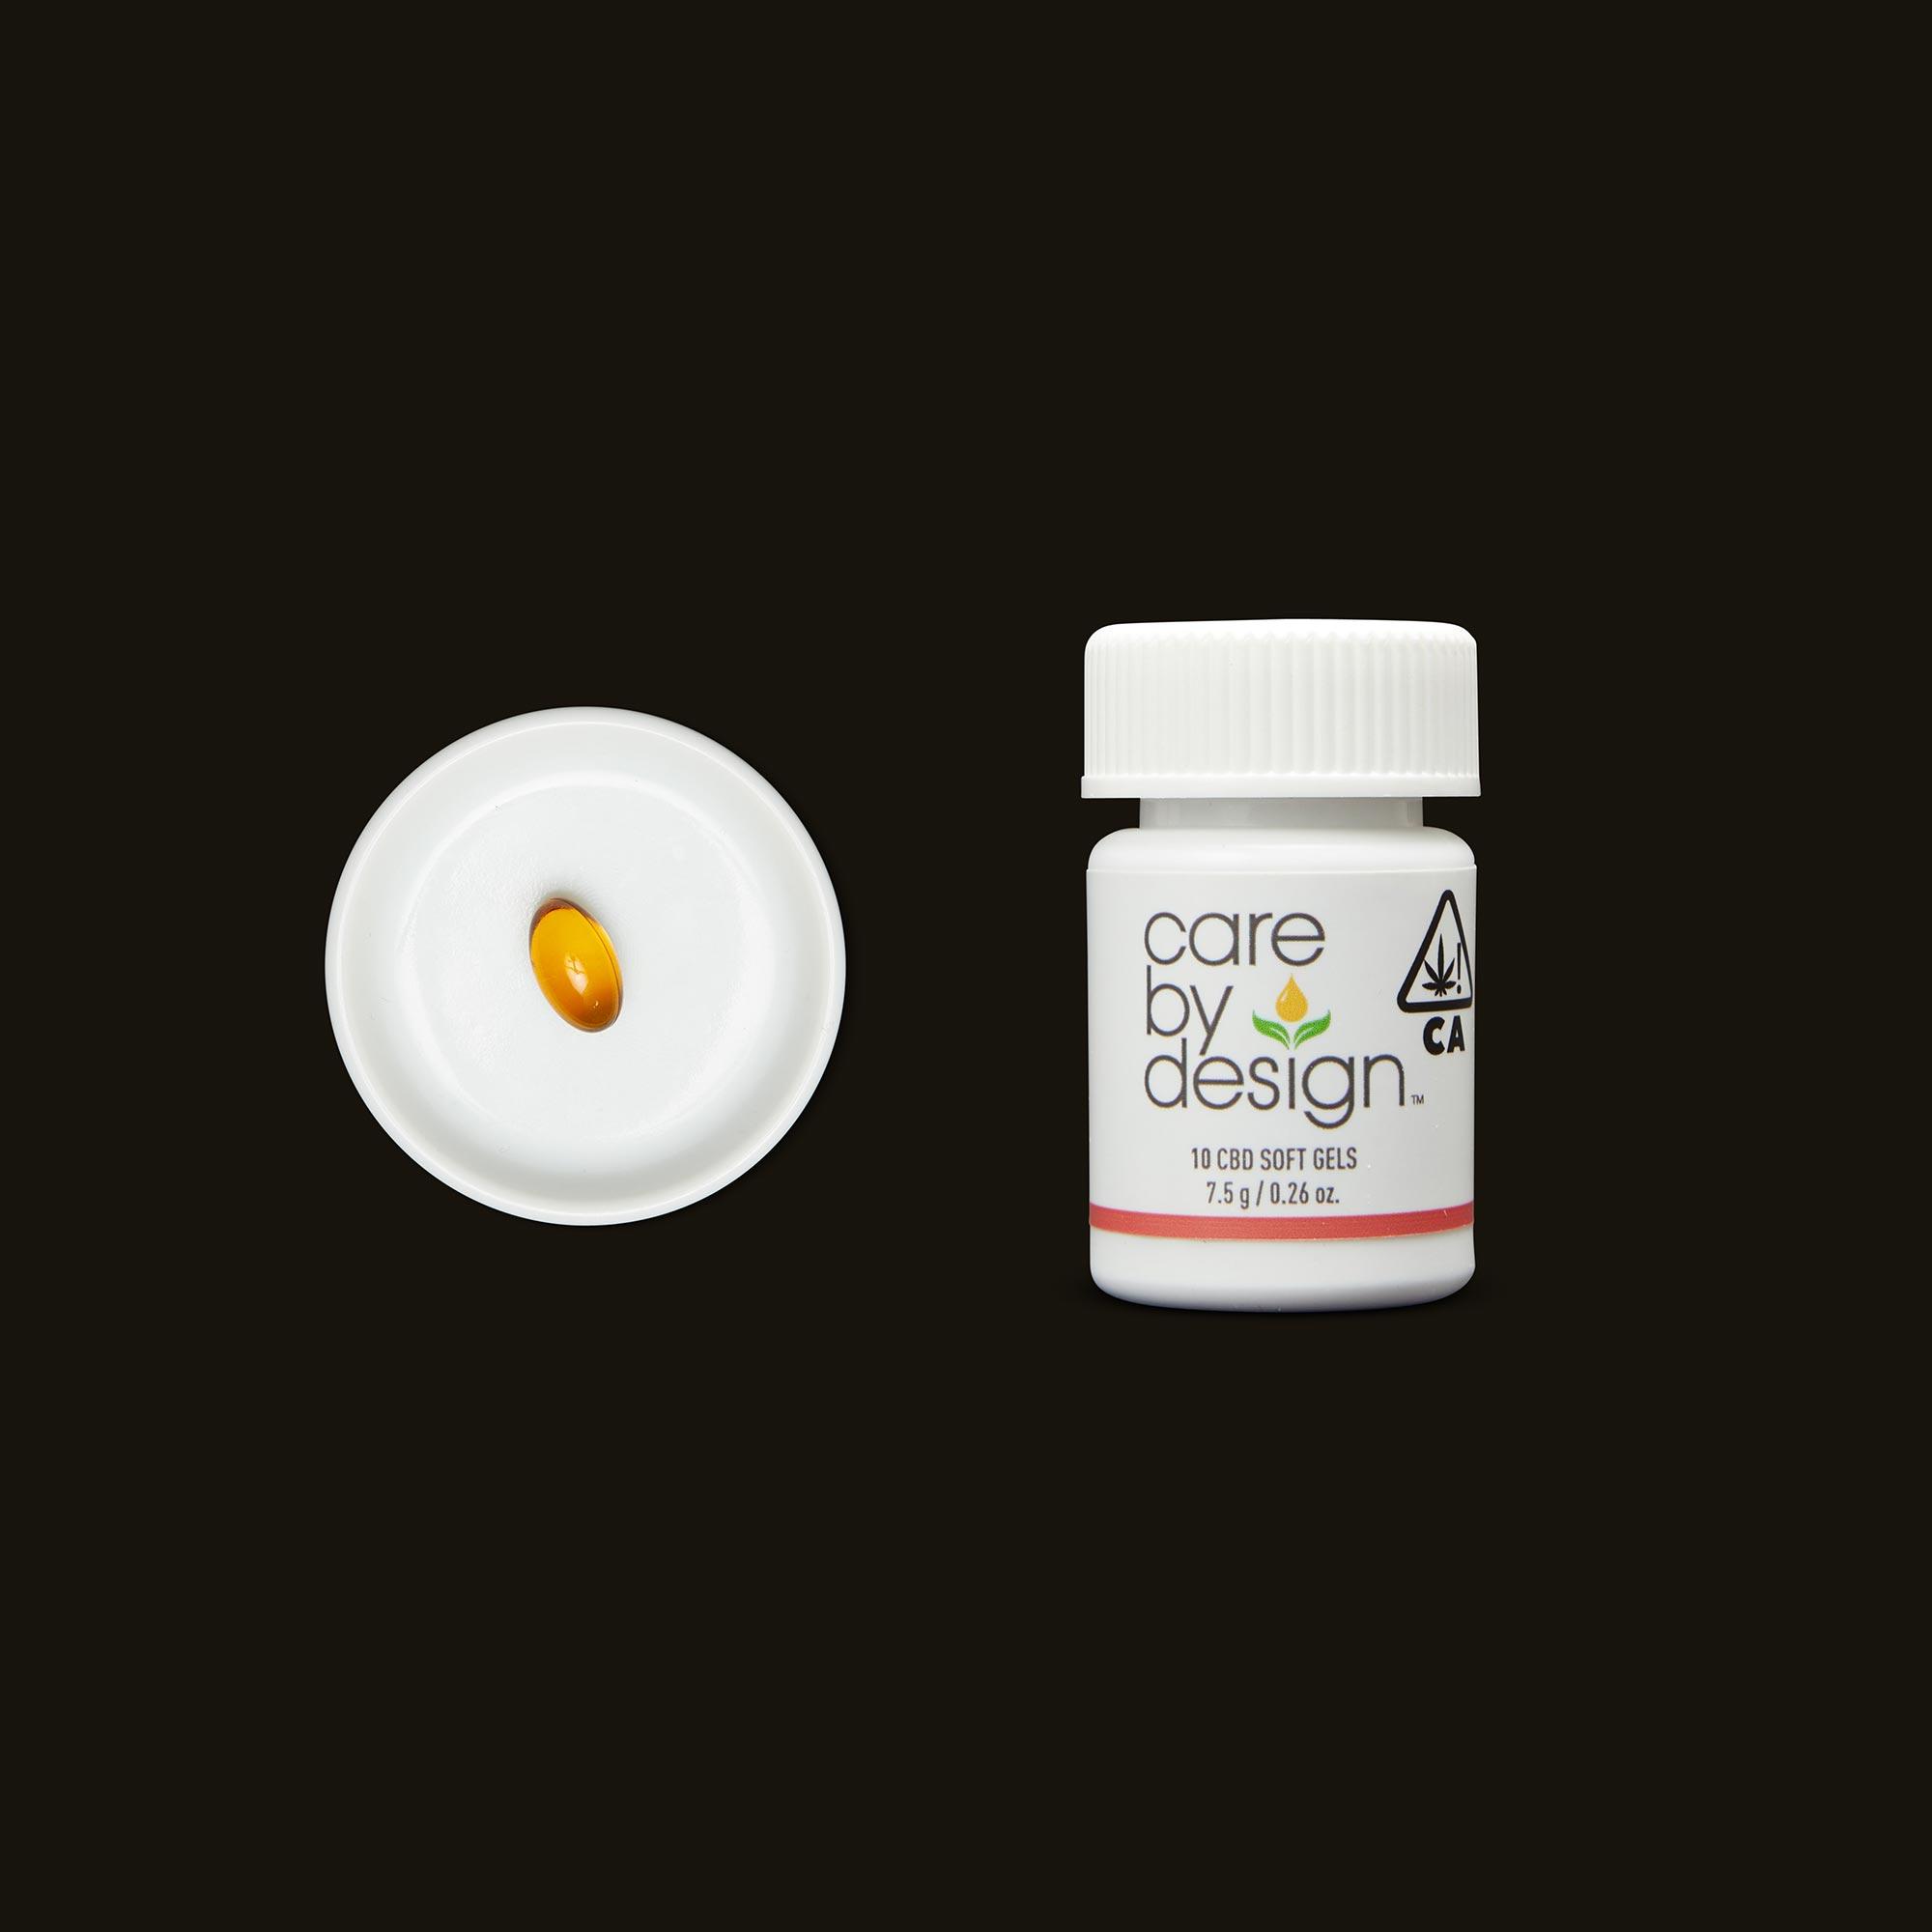 Care By Design 1:1 Soft Gels 10-Pack